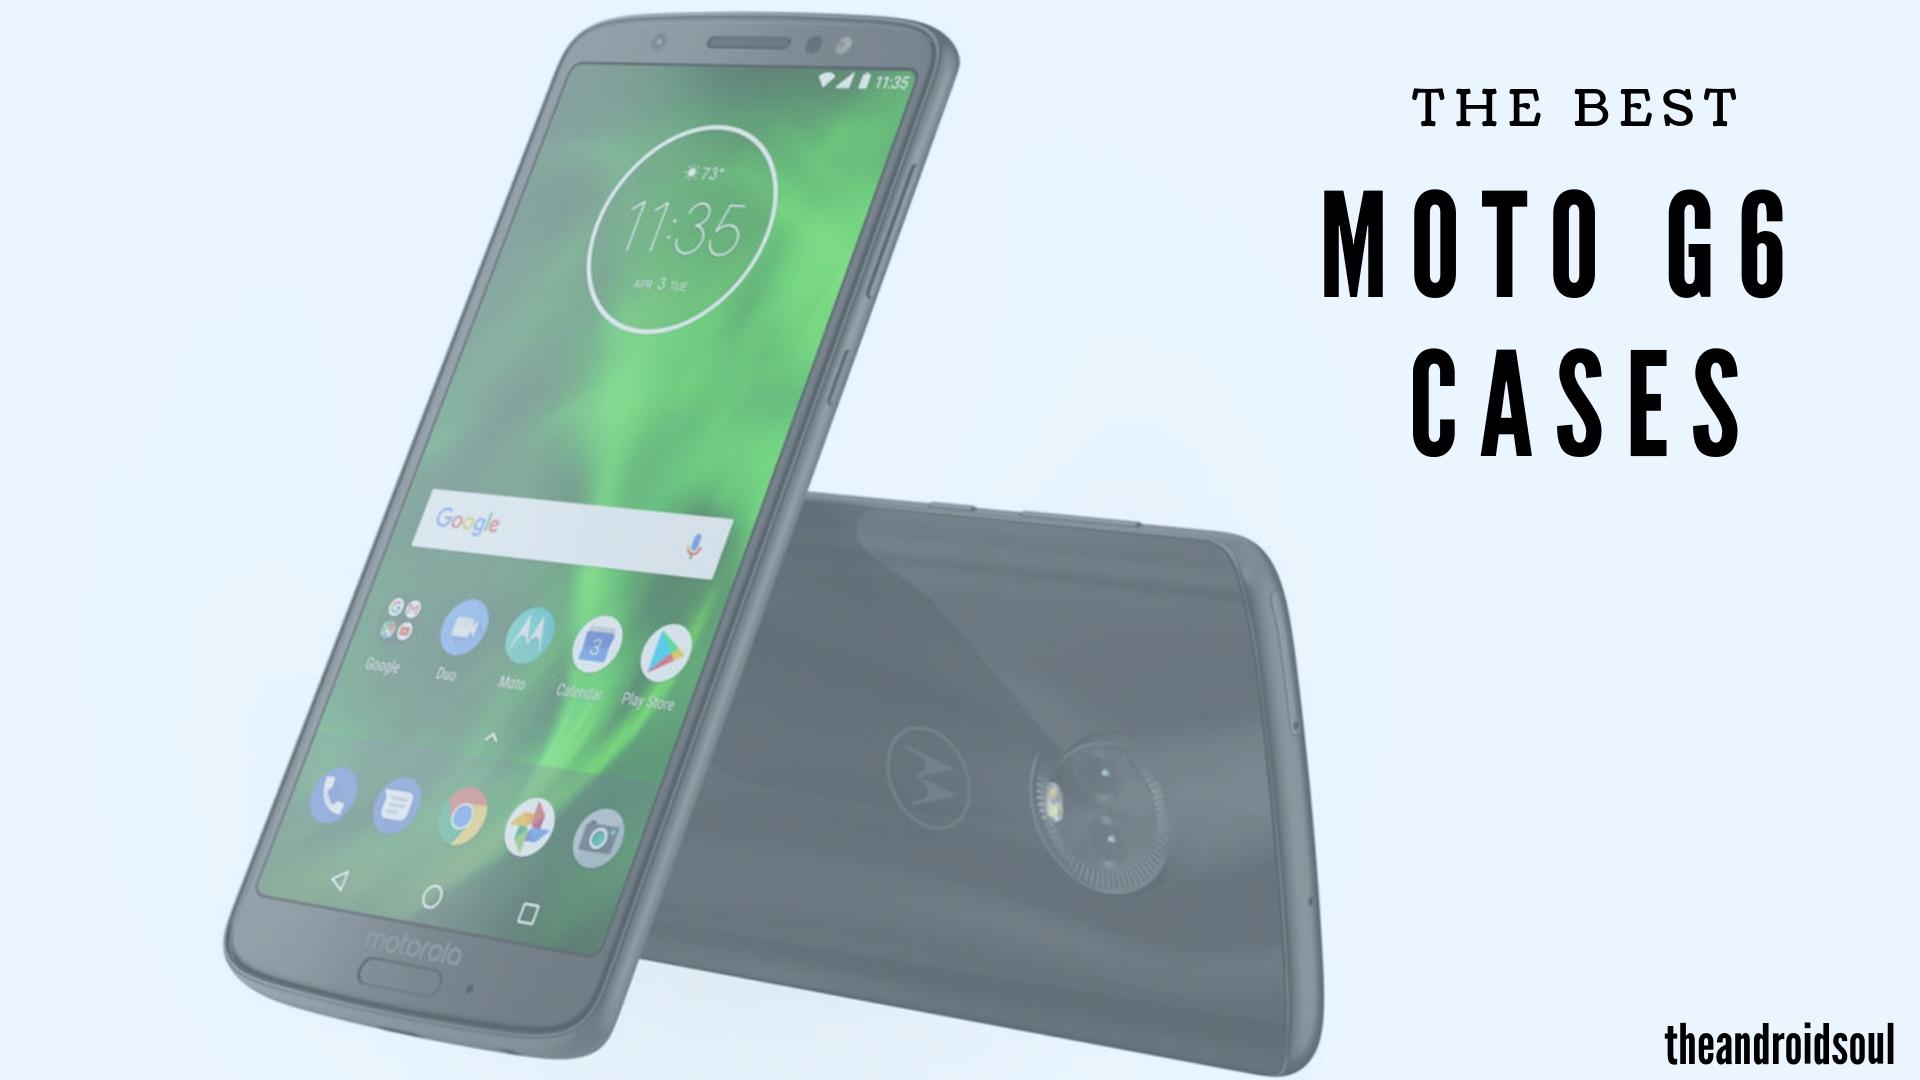 Moto G6 cases